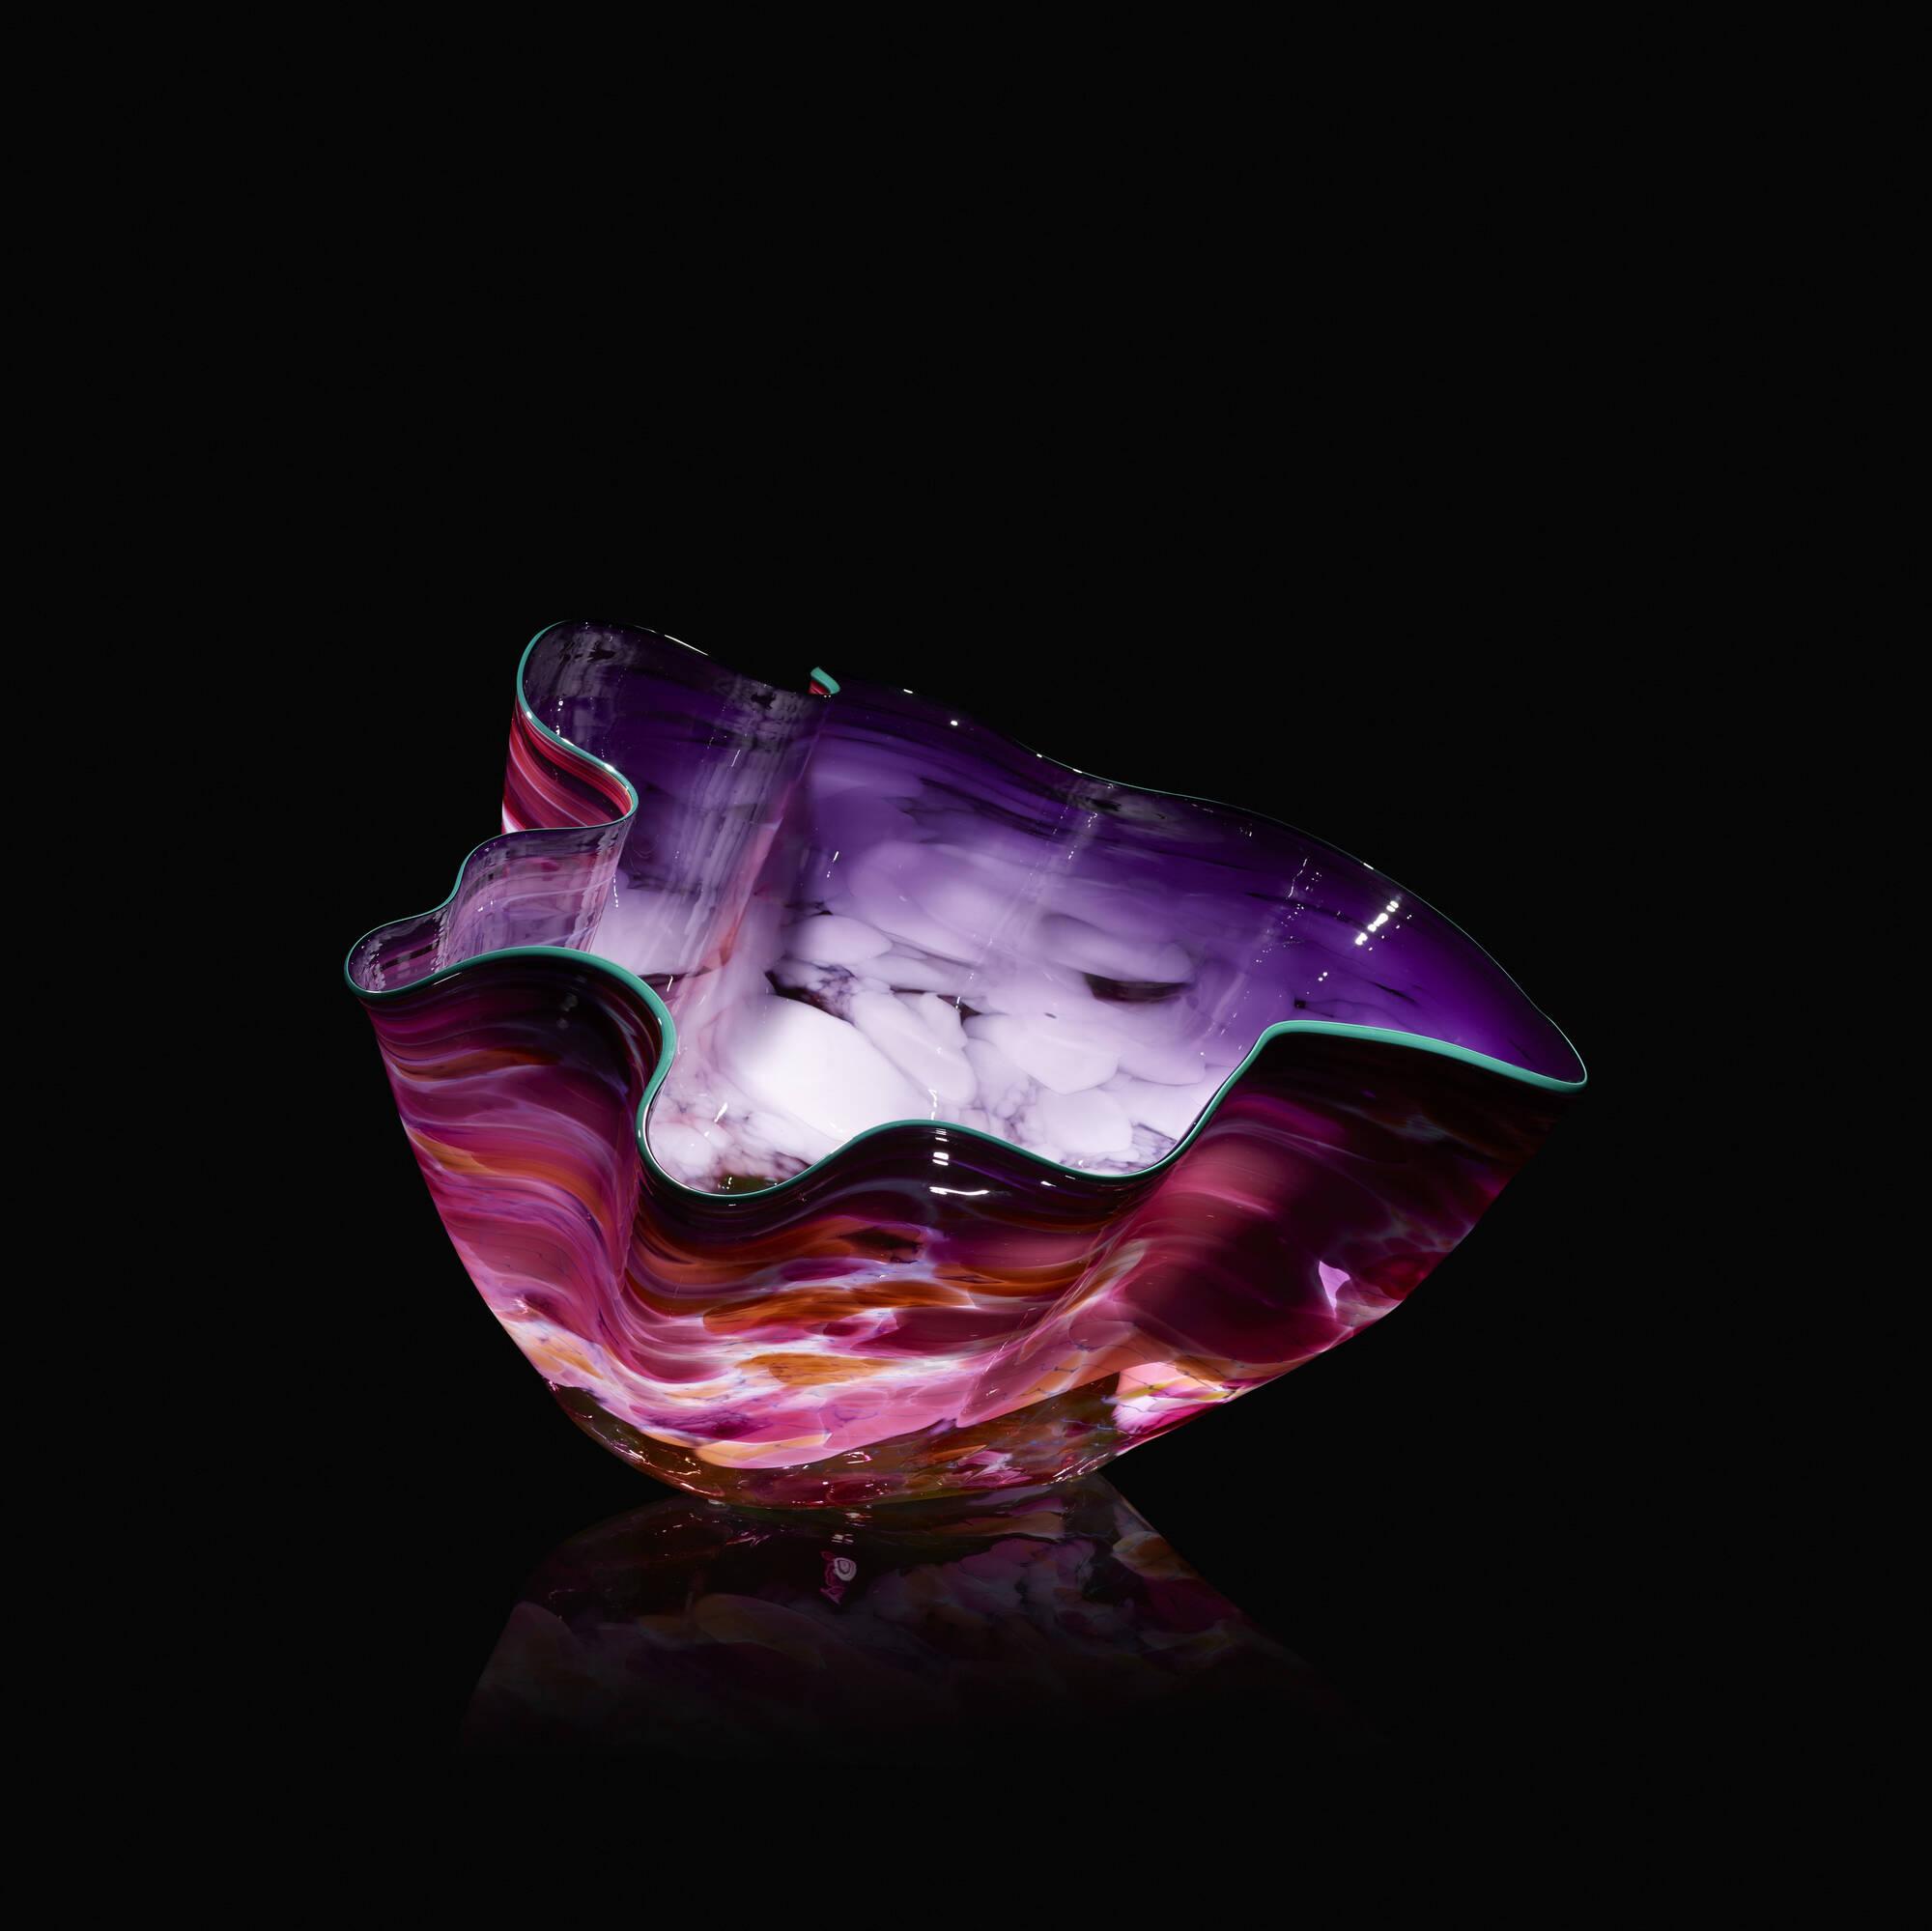 101: Dale Chihuly / Ultramarine Macchia with Emerald Lip Wrap (1 of 2)